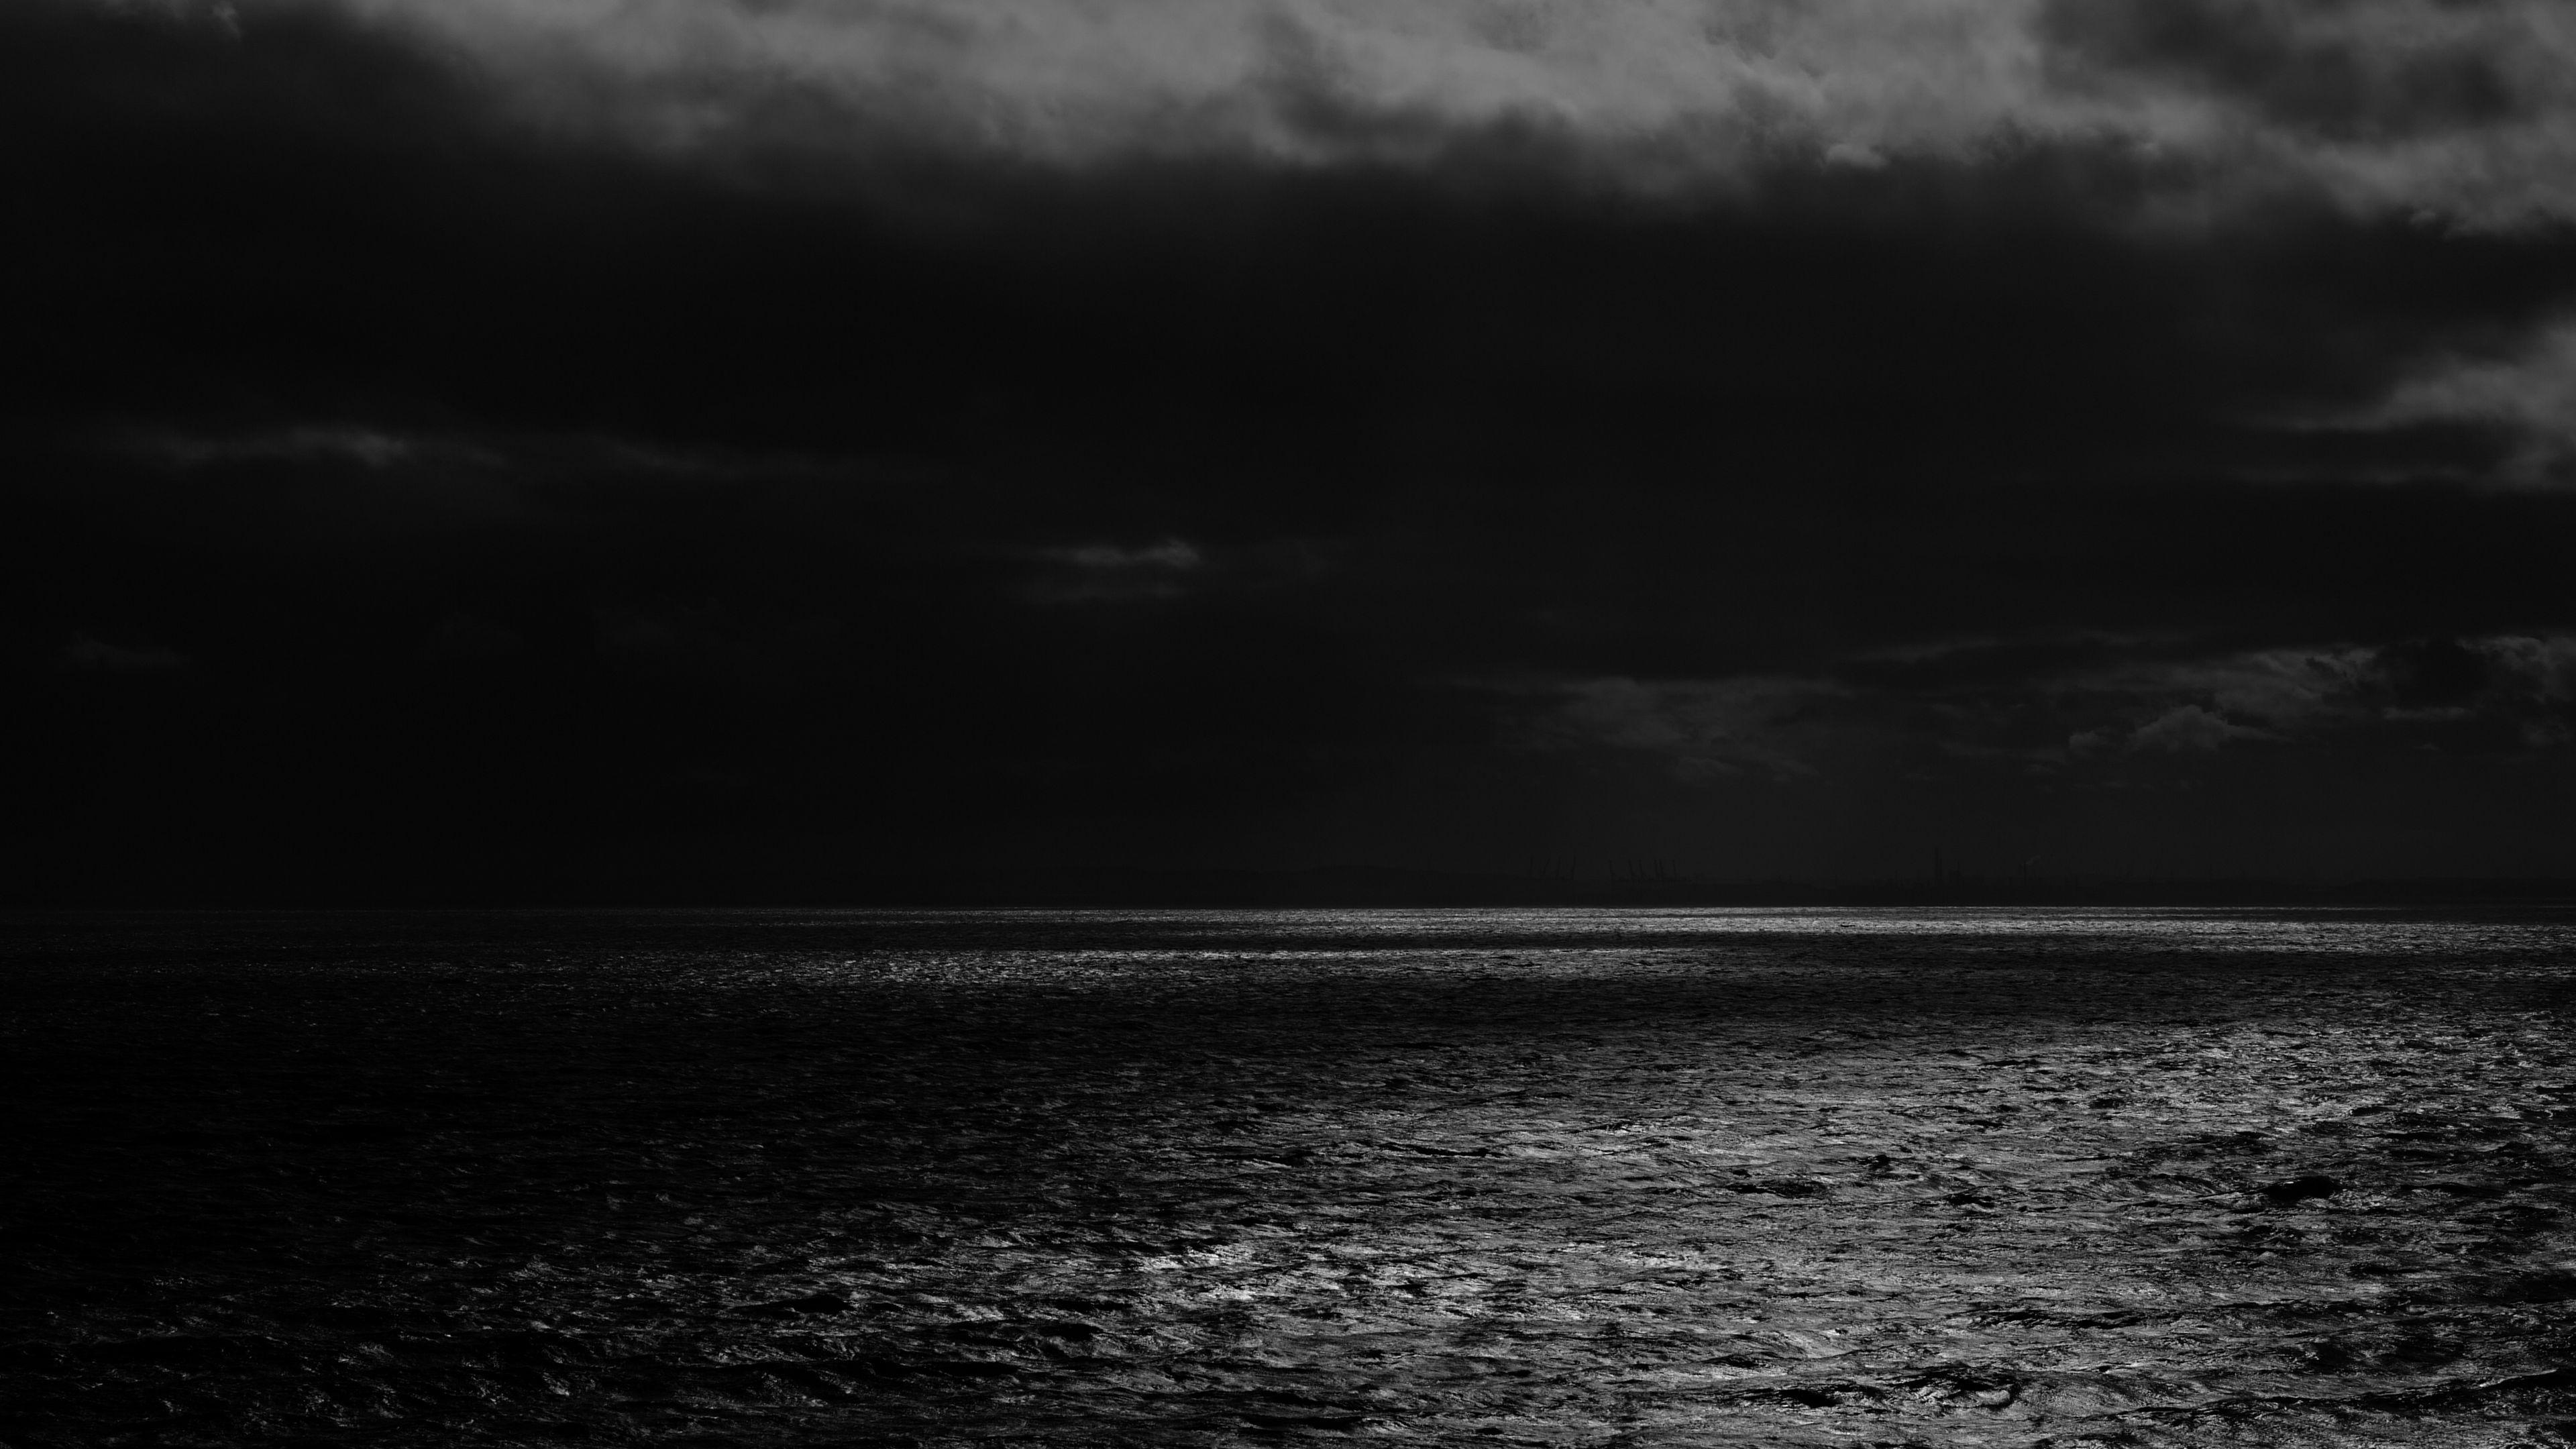 3840x2160 Wallpaper sea, horizon, bw, overcast, clouds, ripples